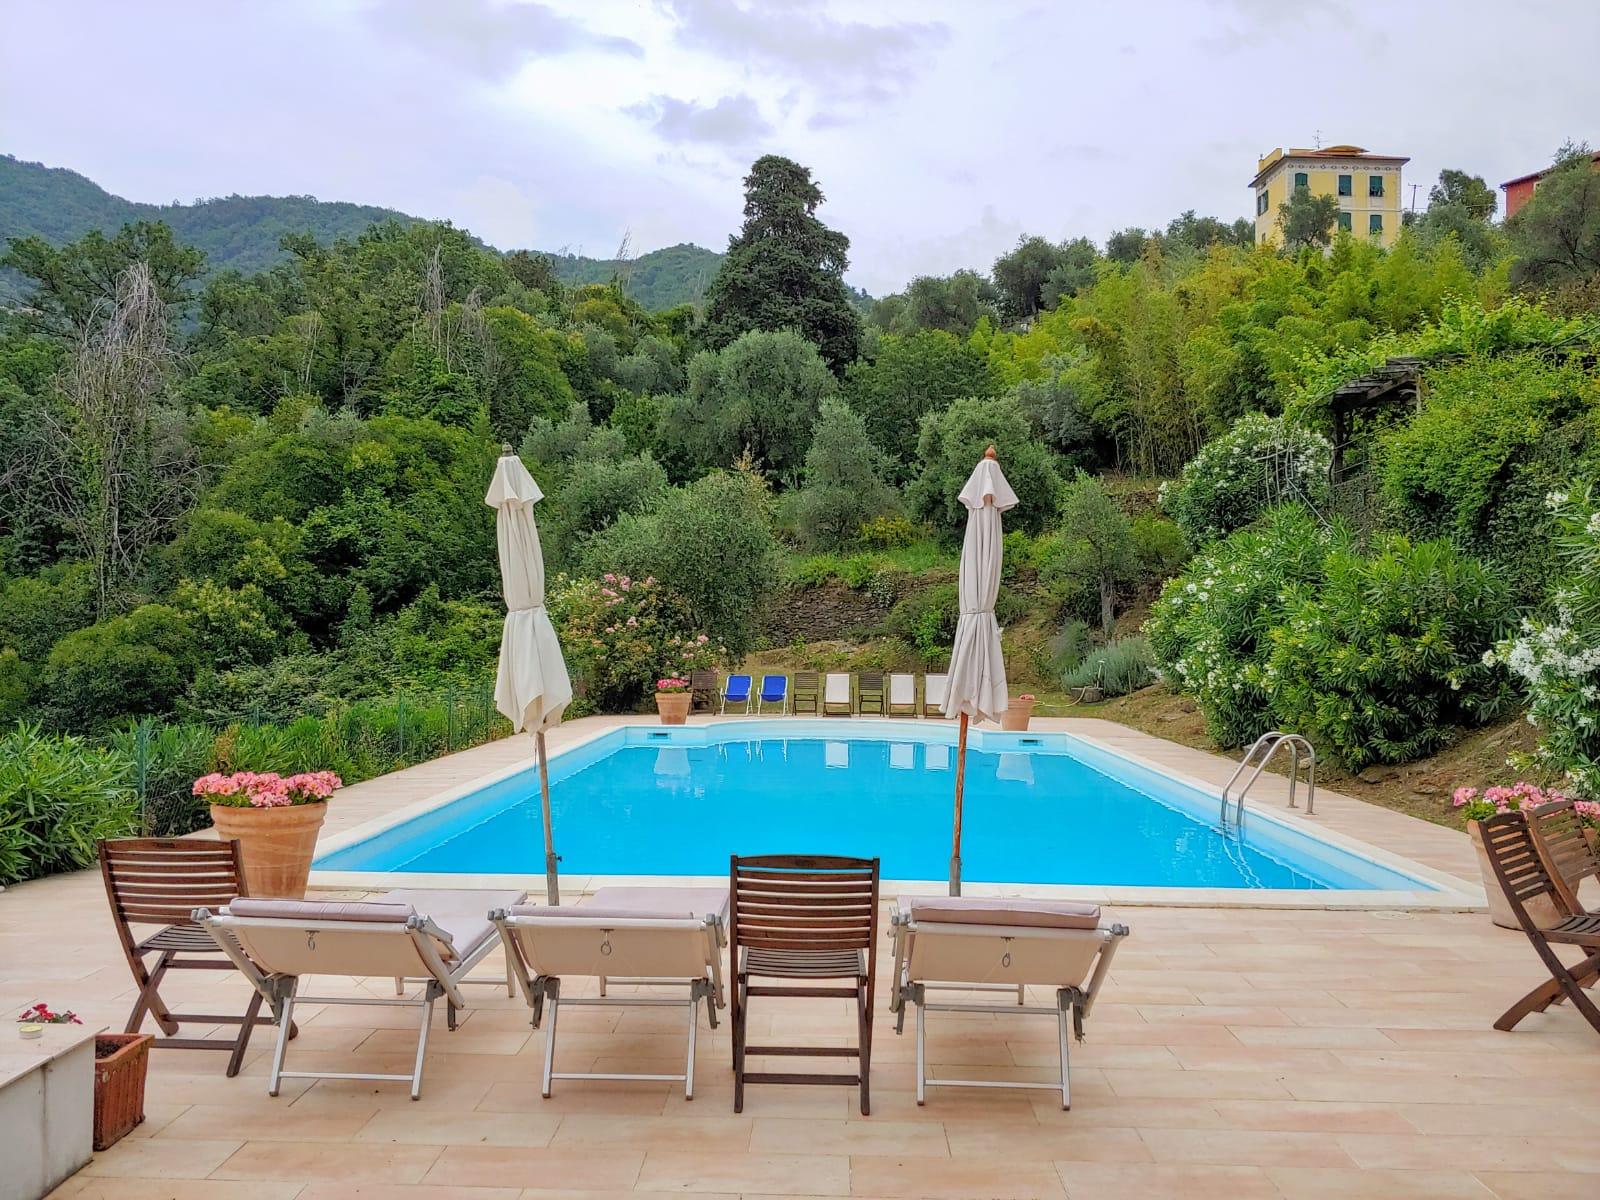 Apartment Hintown Villa Diana Garden Suite with SwimmingPool photo 19141988